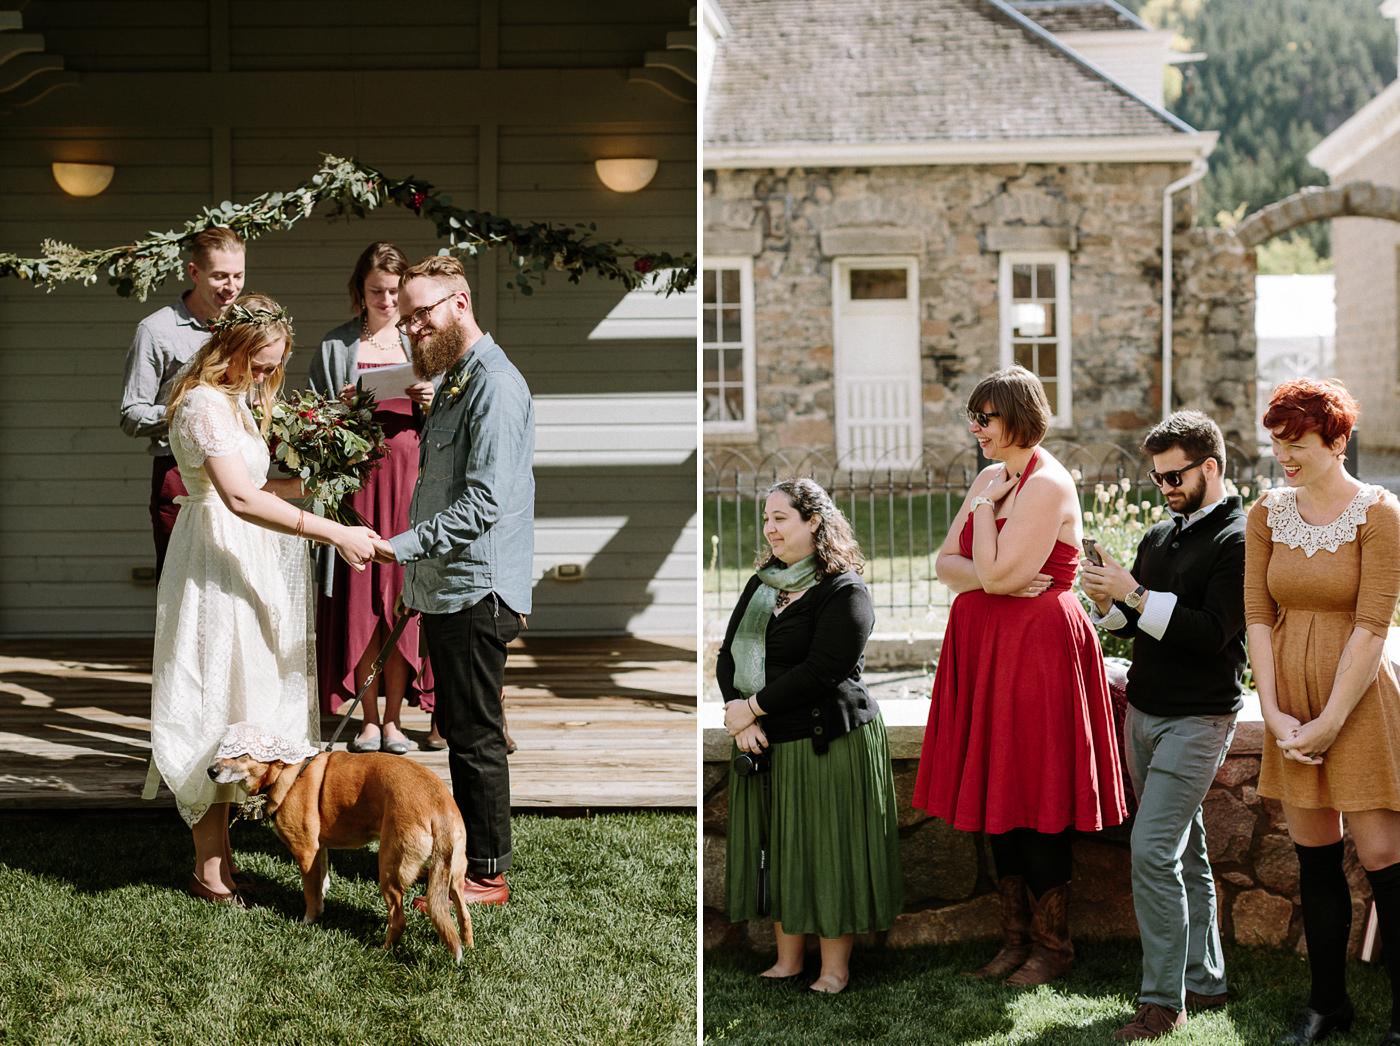 Dog under bride's wedding dress during ceremony